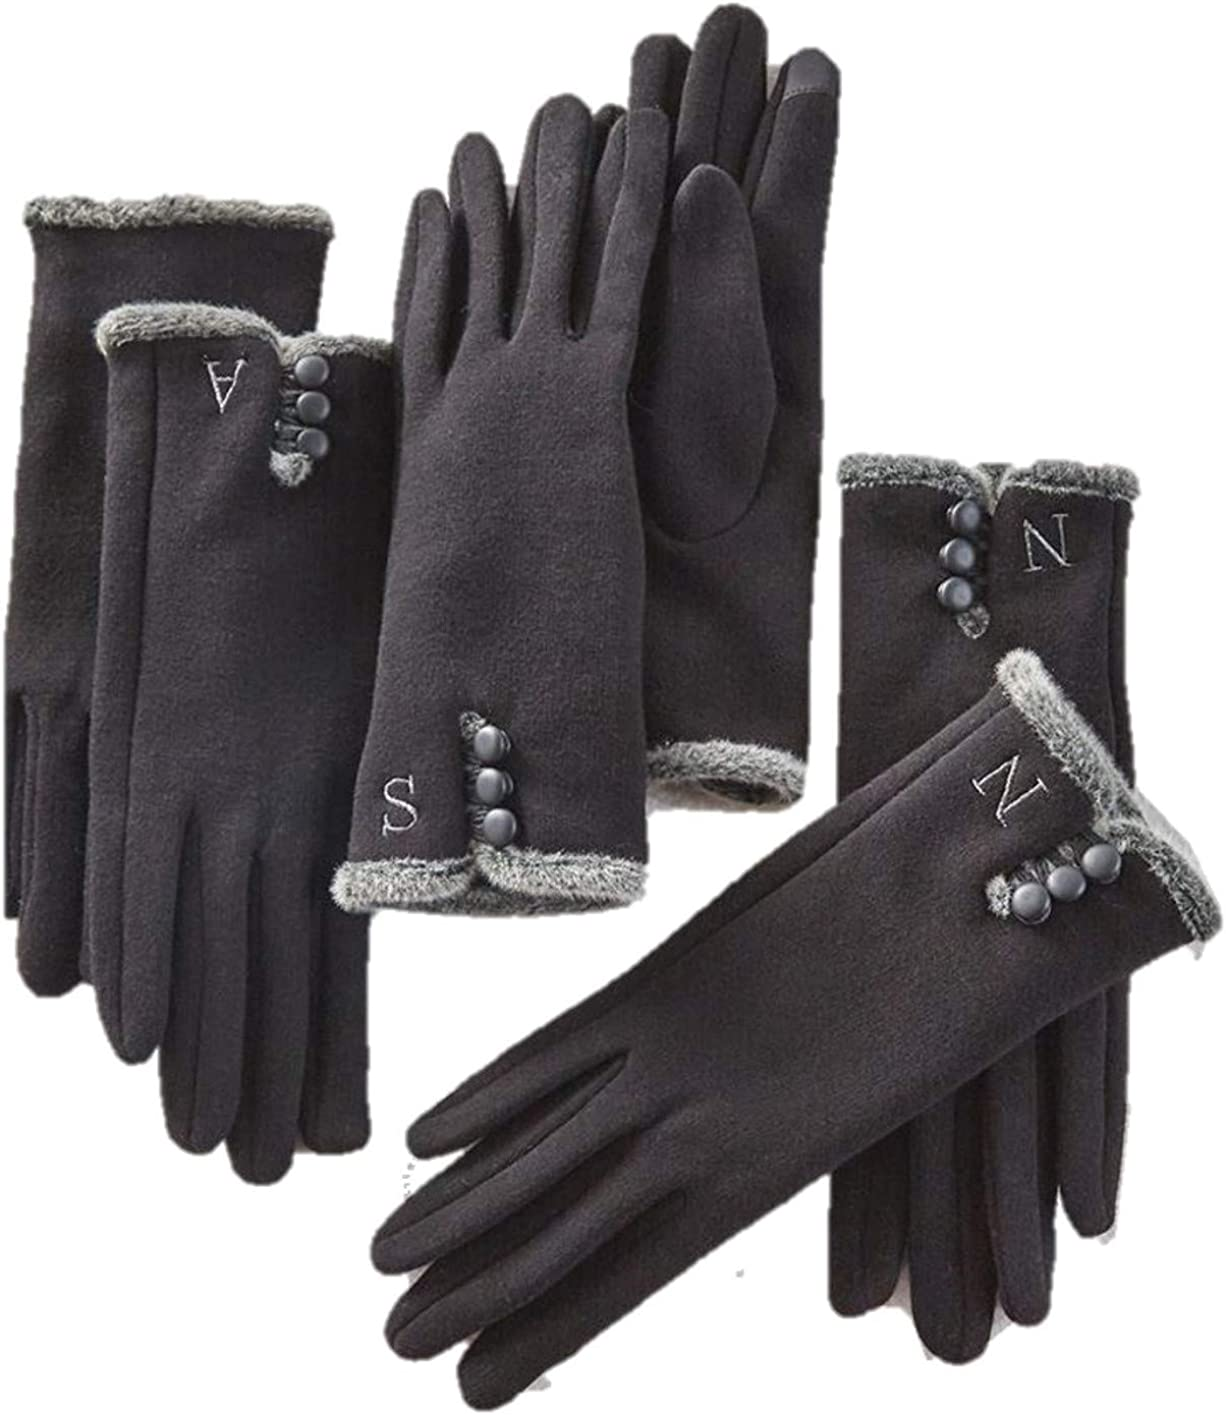 Mud Pie Women's Smart Screen Initial Letter Gloves, Black, One Size